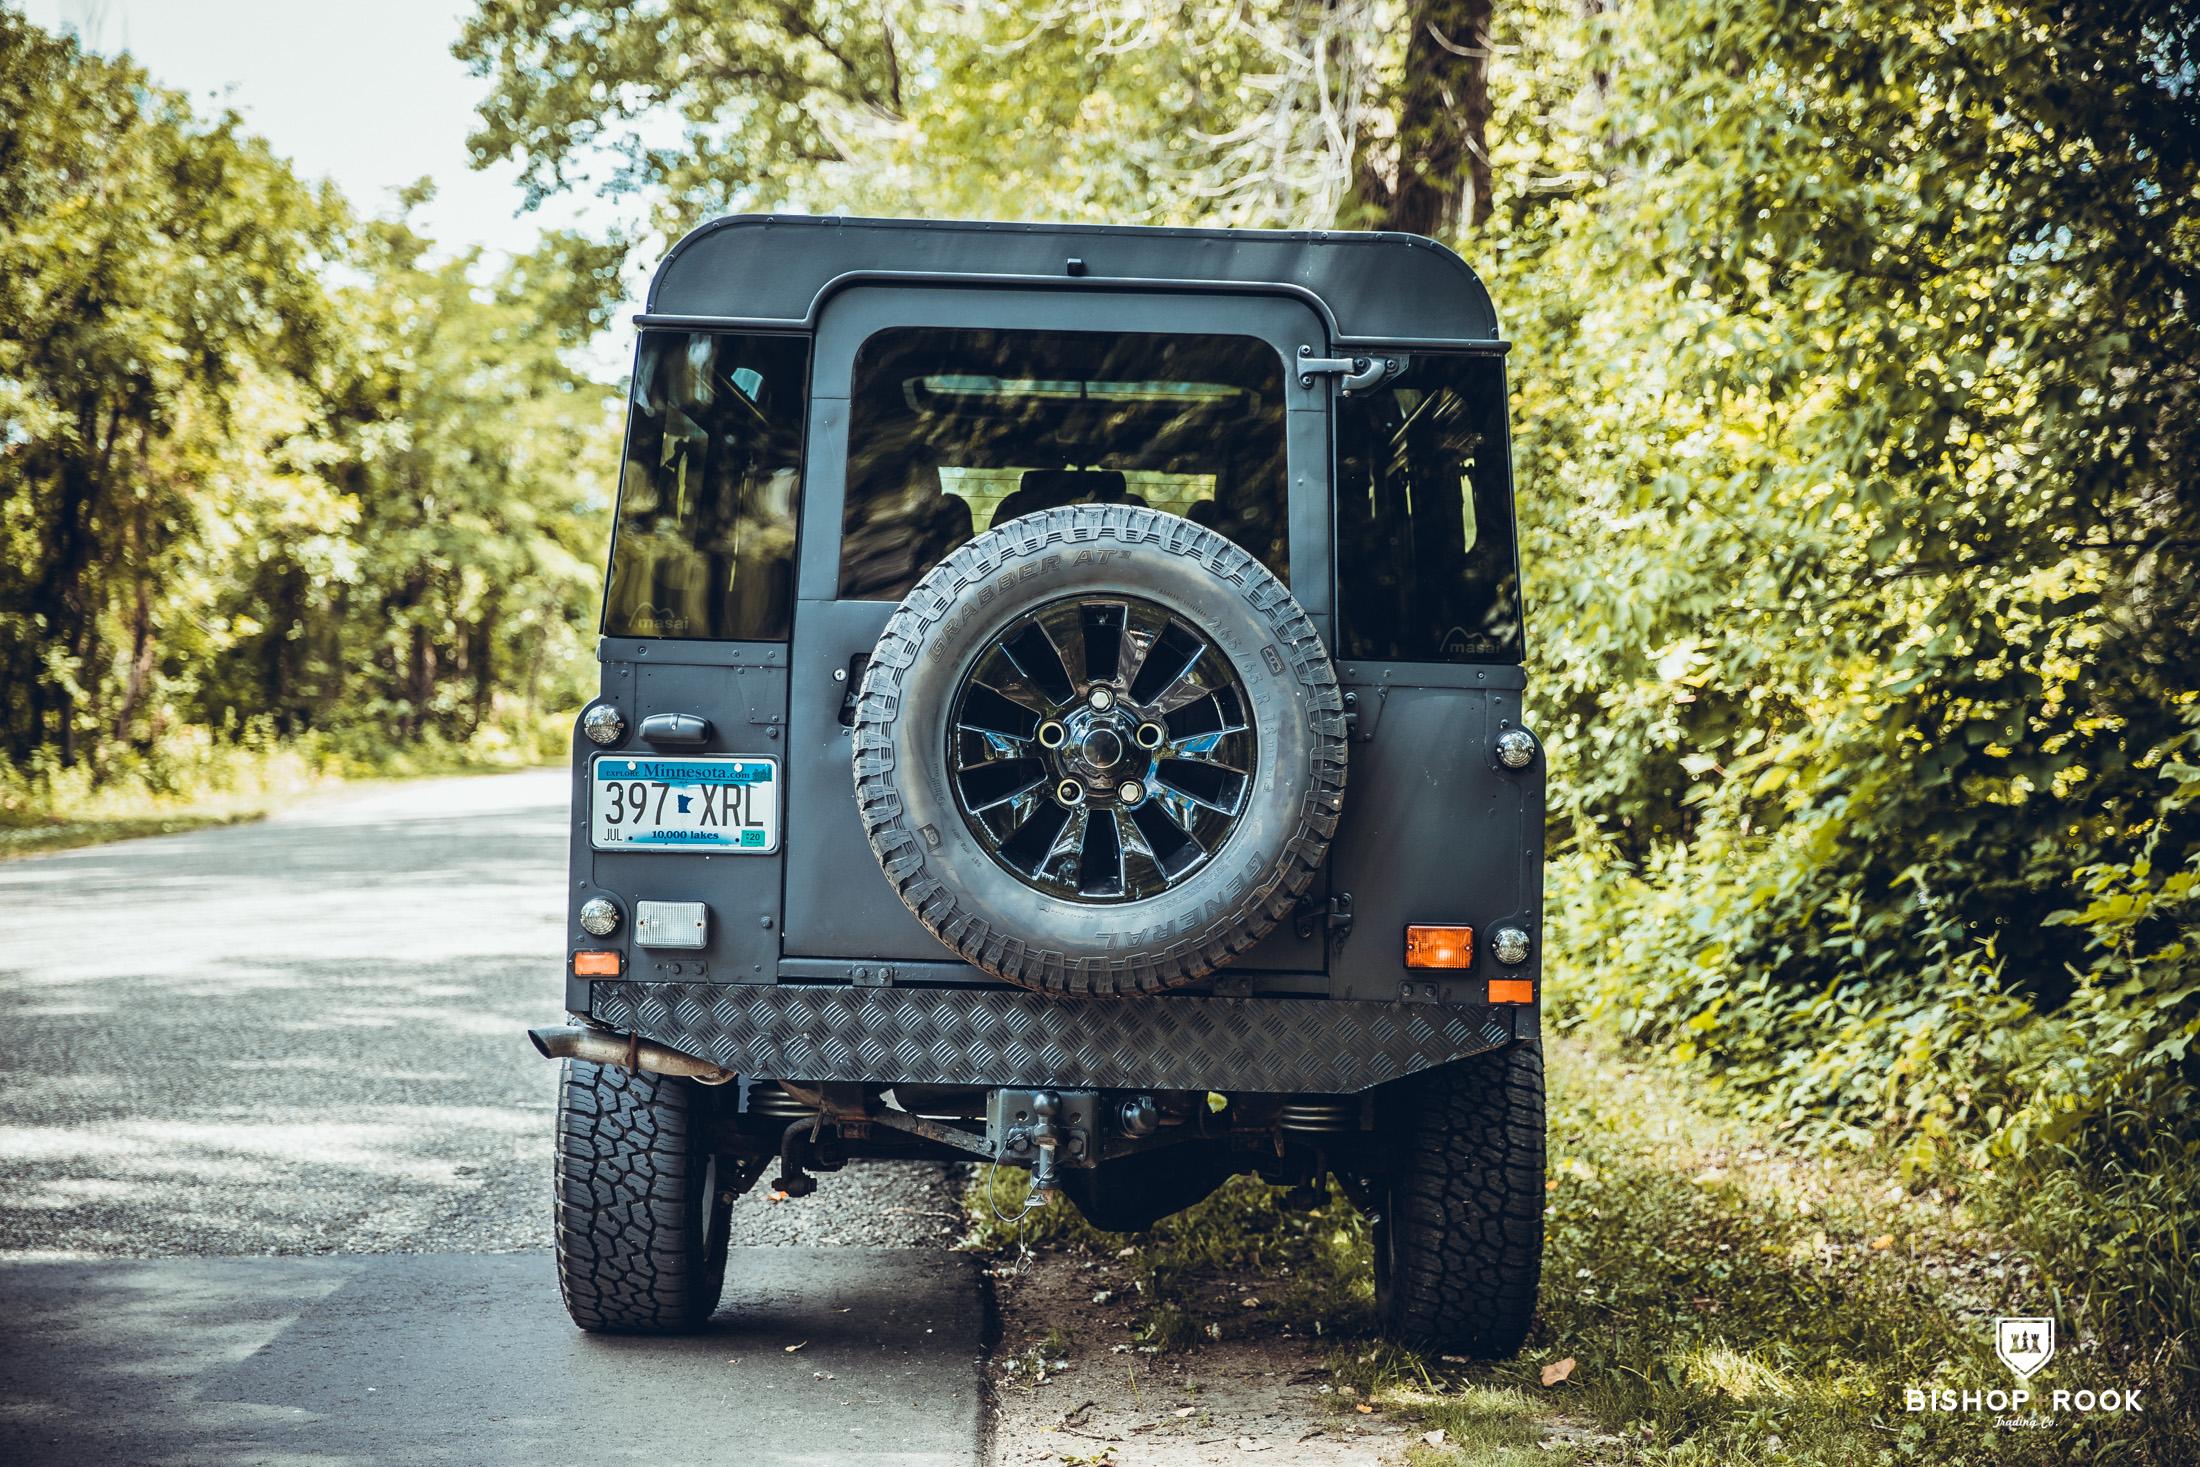 Grim – Land Rover Defender 110 – 200Tdi